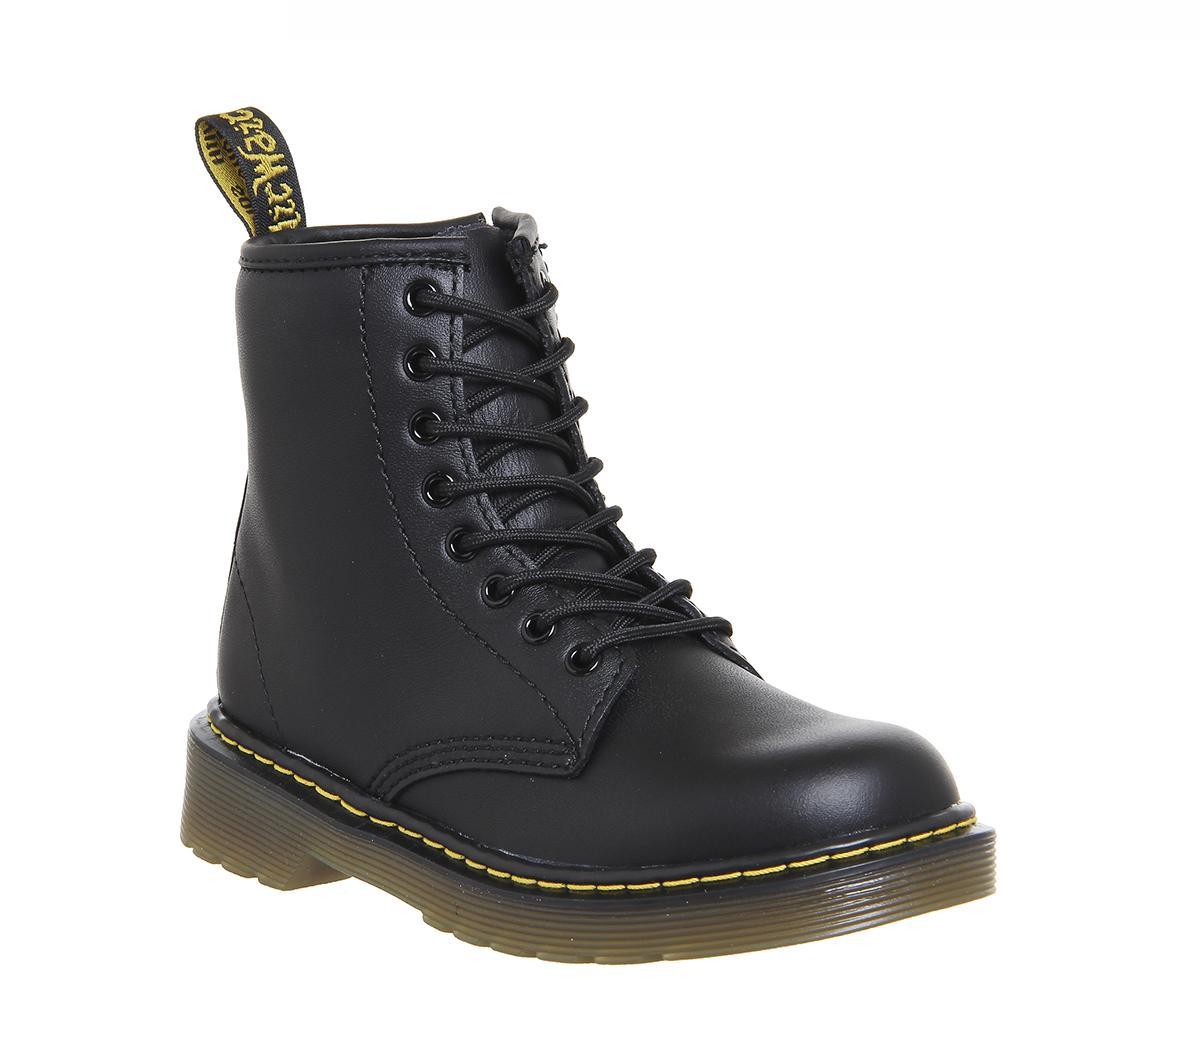 Delaney Junior Lace Up Inside Zip Boots